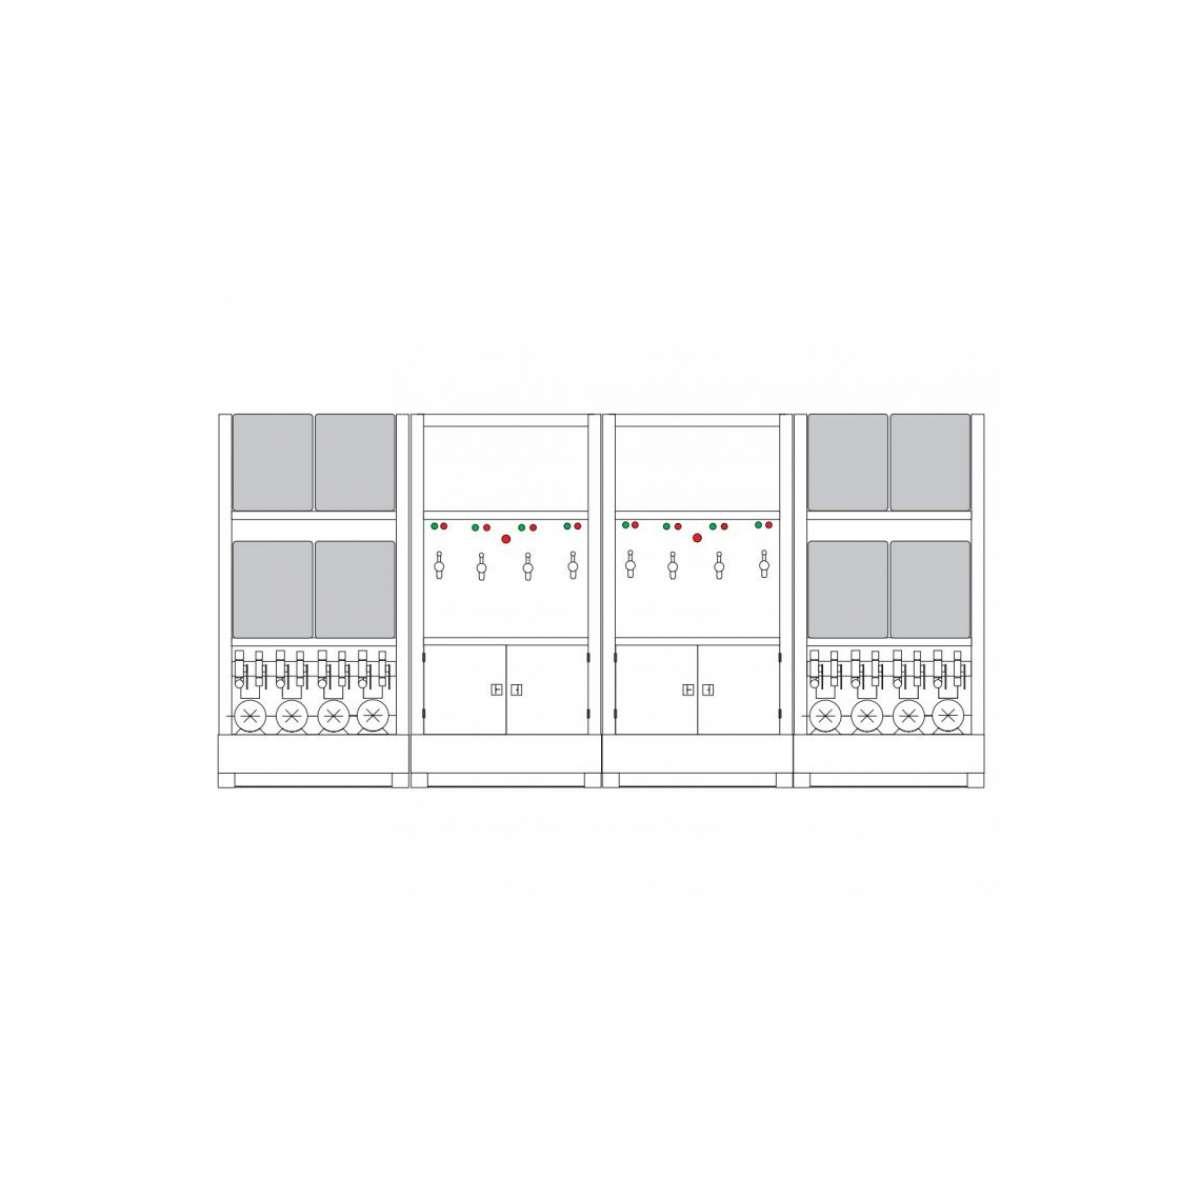 Lubrication Work Center - 8 x 65 Gallon